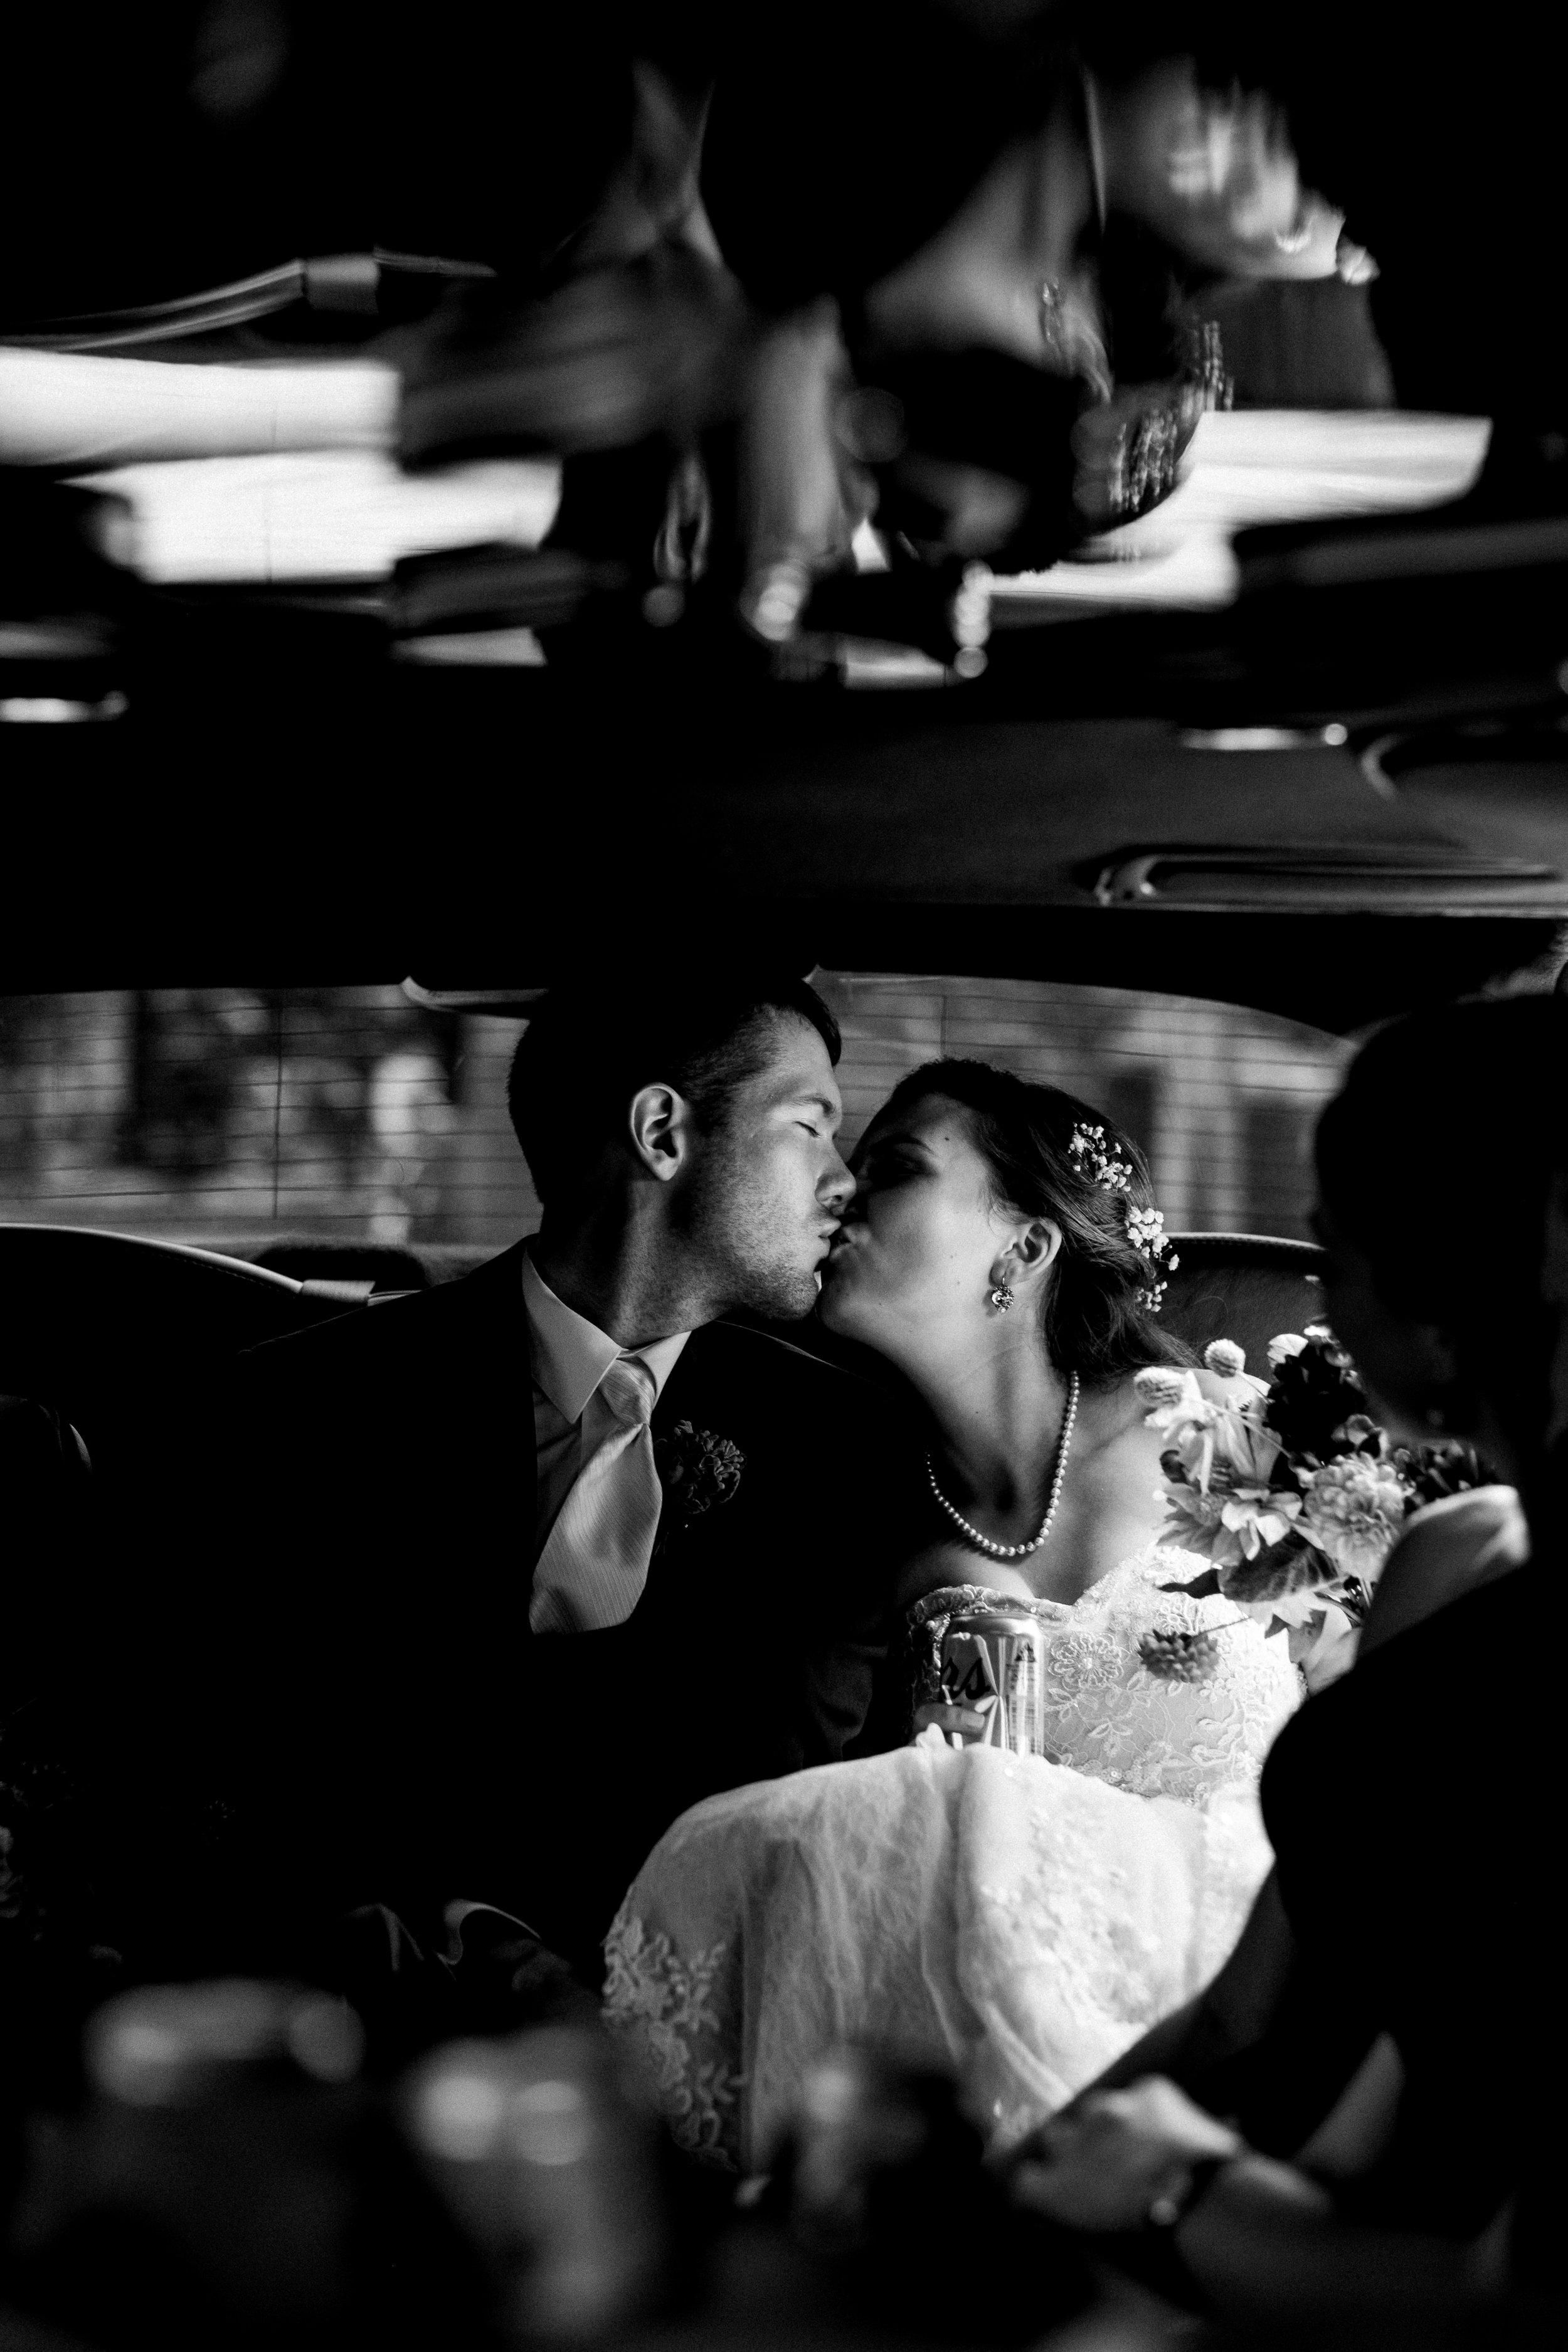 Bride and groom ride in Birmingham Limousine Service.